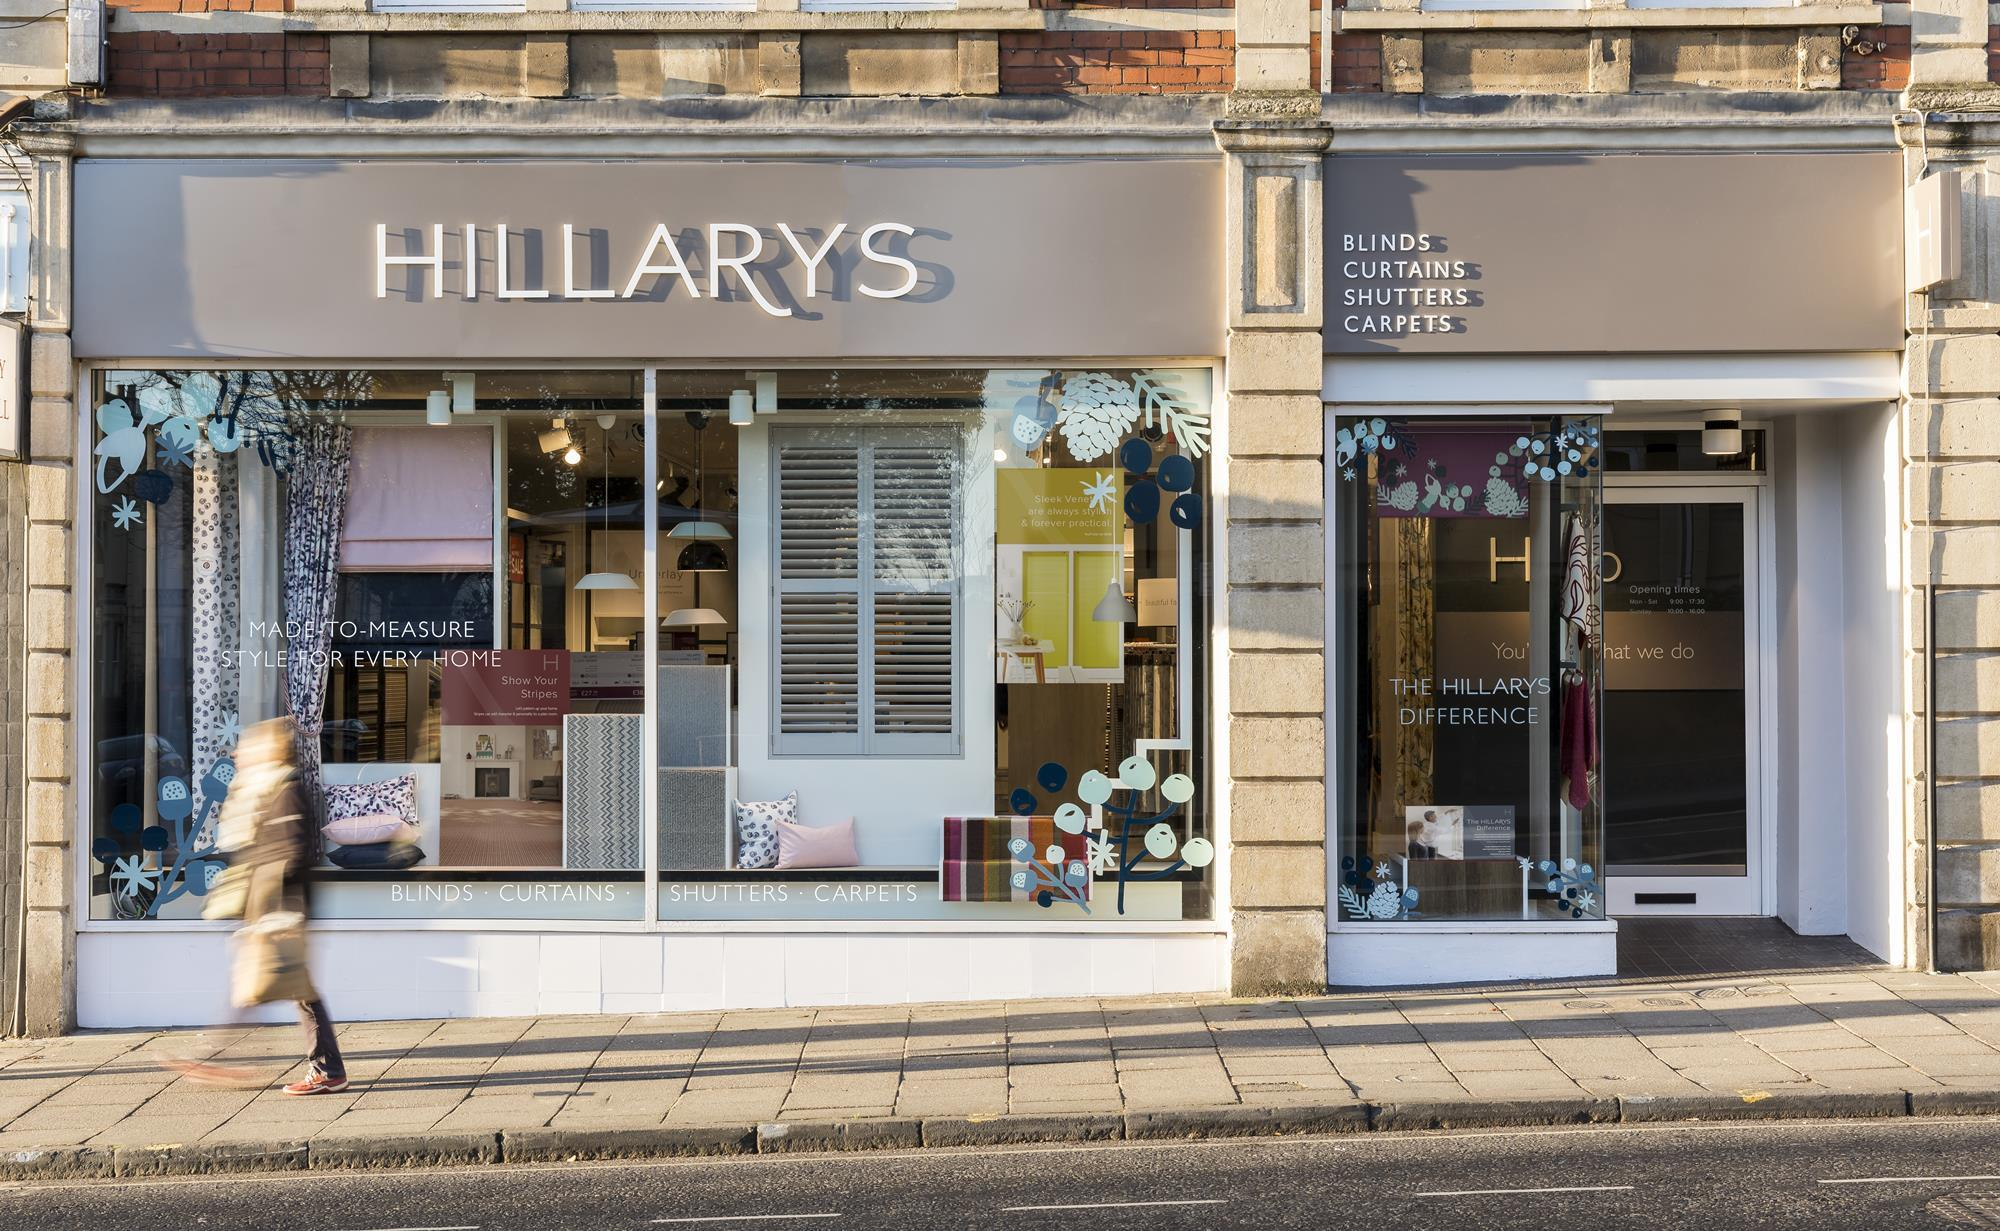 Hillarys Blinds Online >> Hillarys blinds sold to Hunter Douglas in £300m deal   News   Retail Week